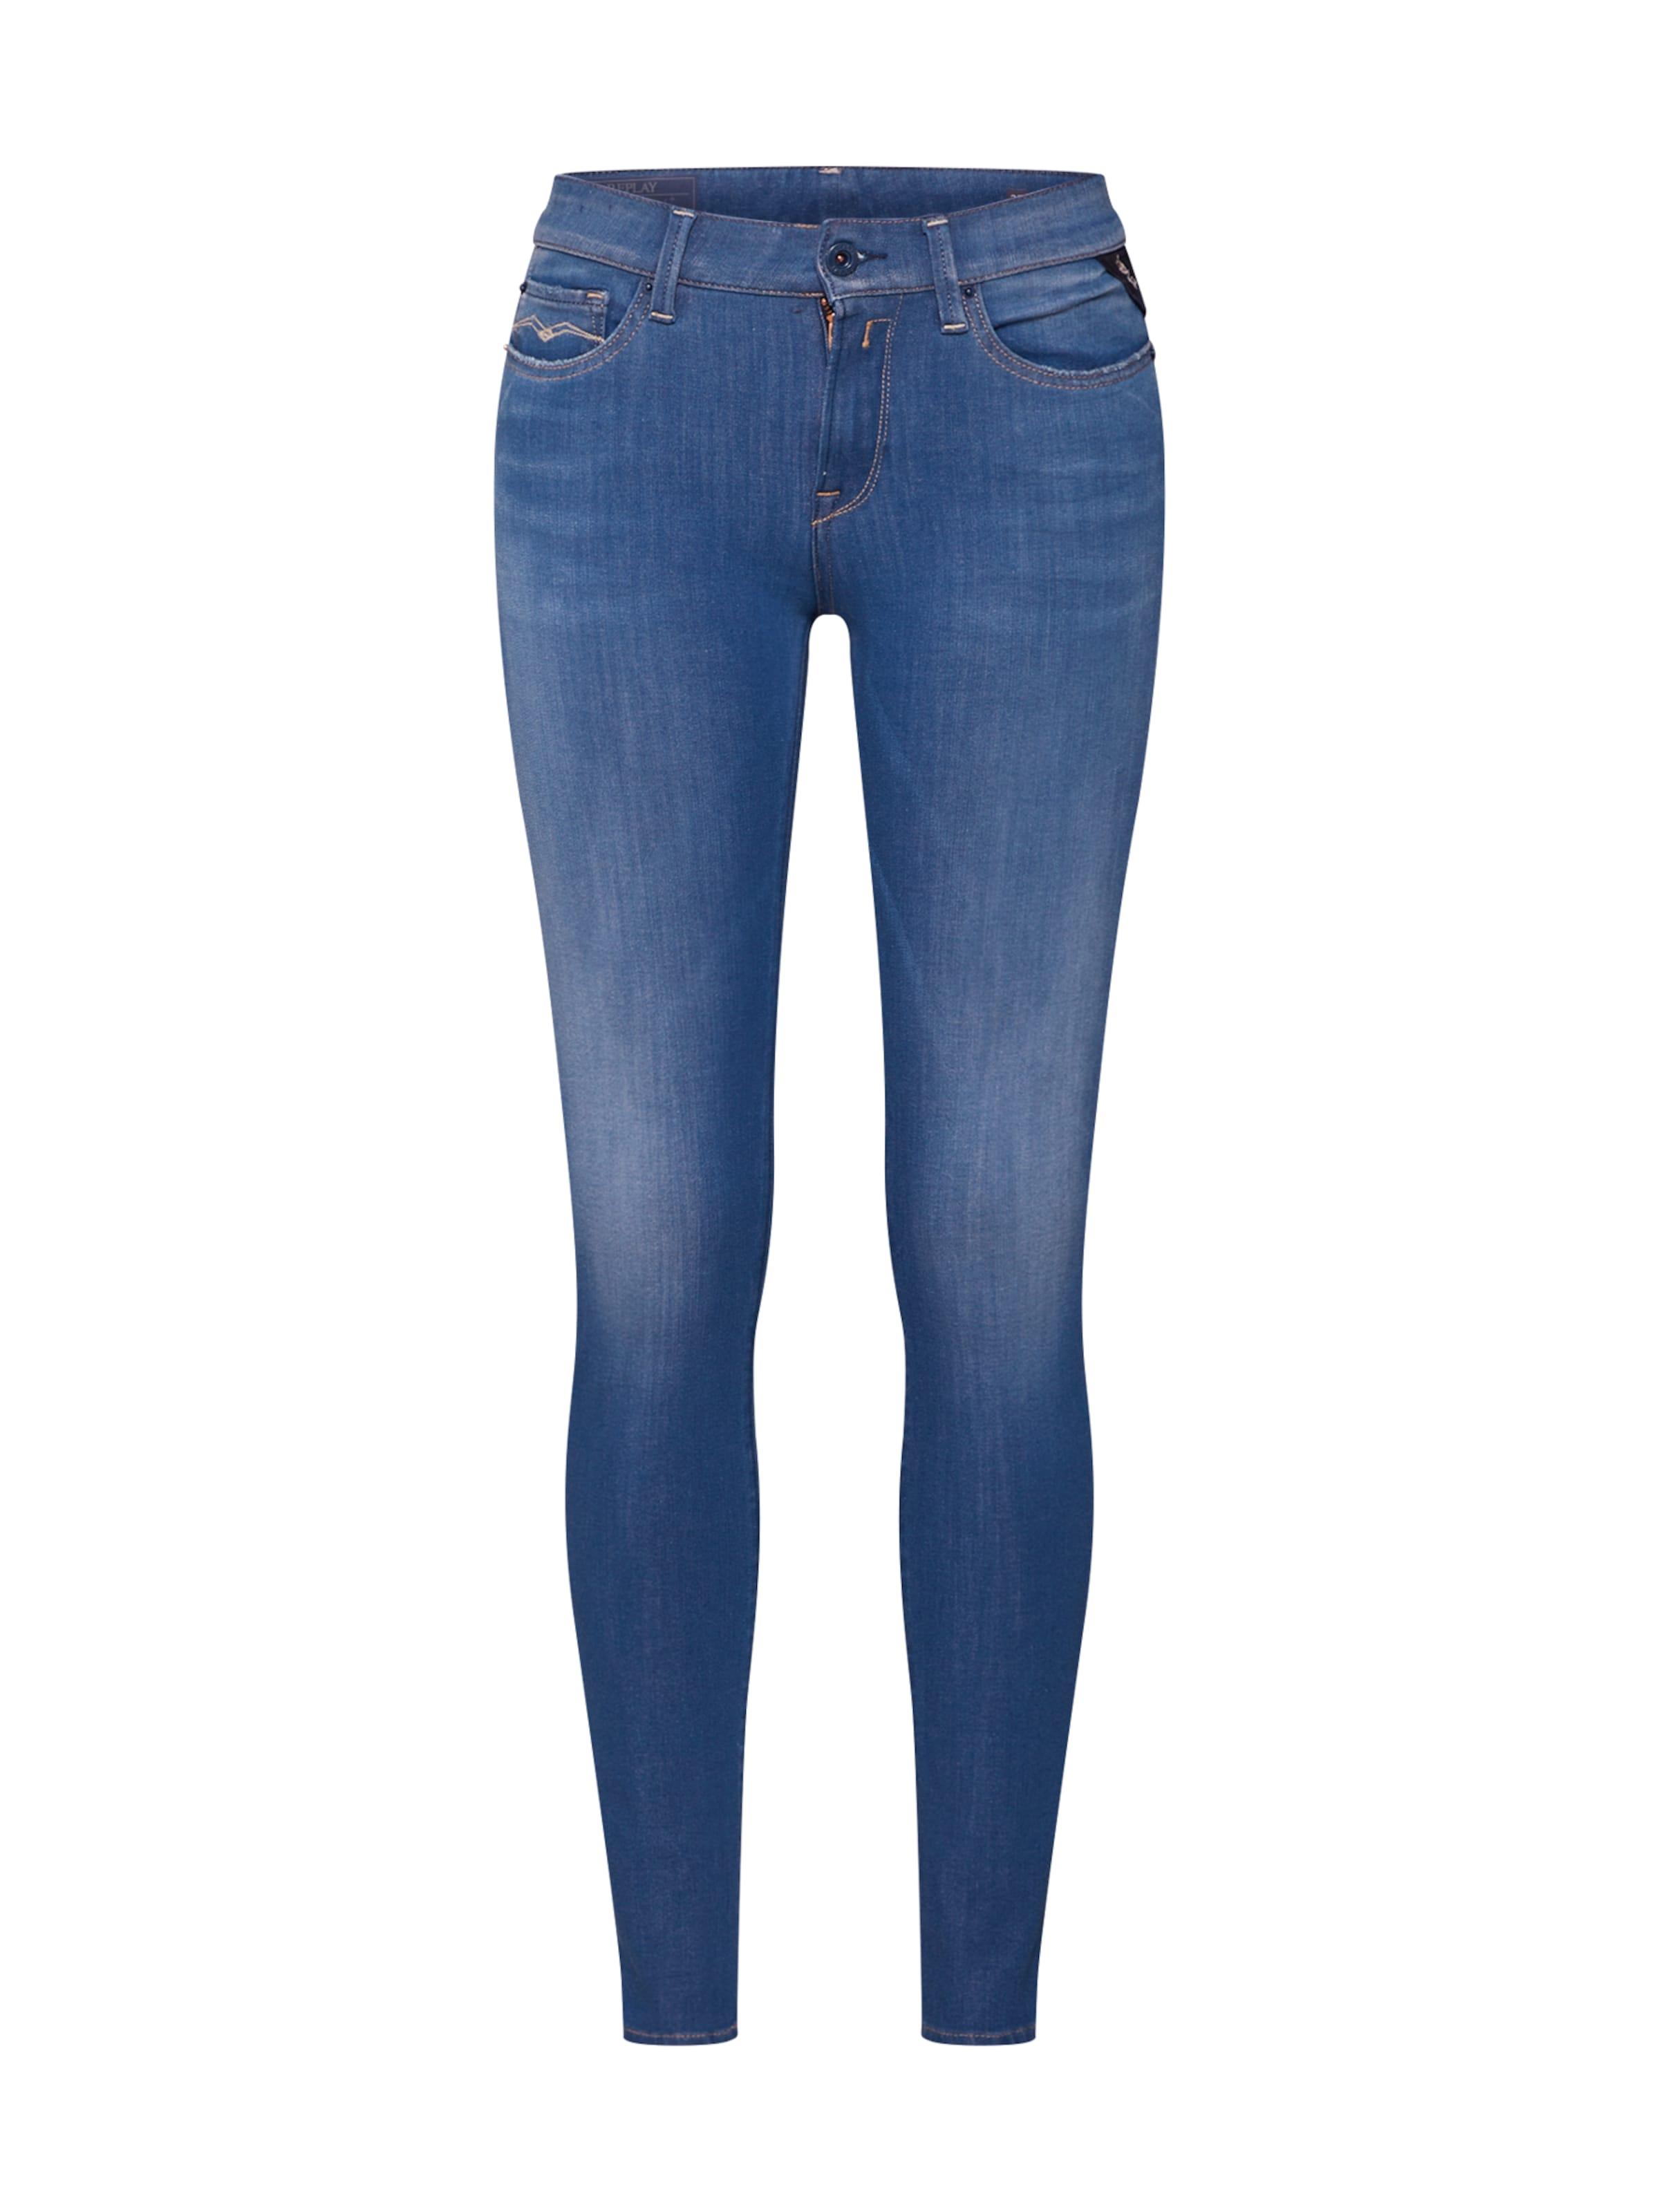 Replay High In Waist' Jeans 'luz Denim Blue dorxBWeC